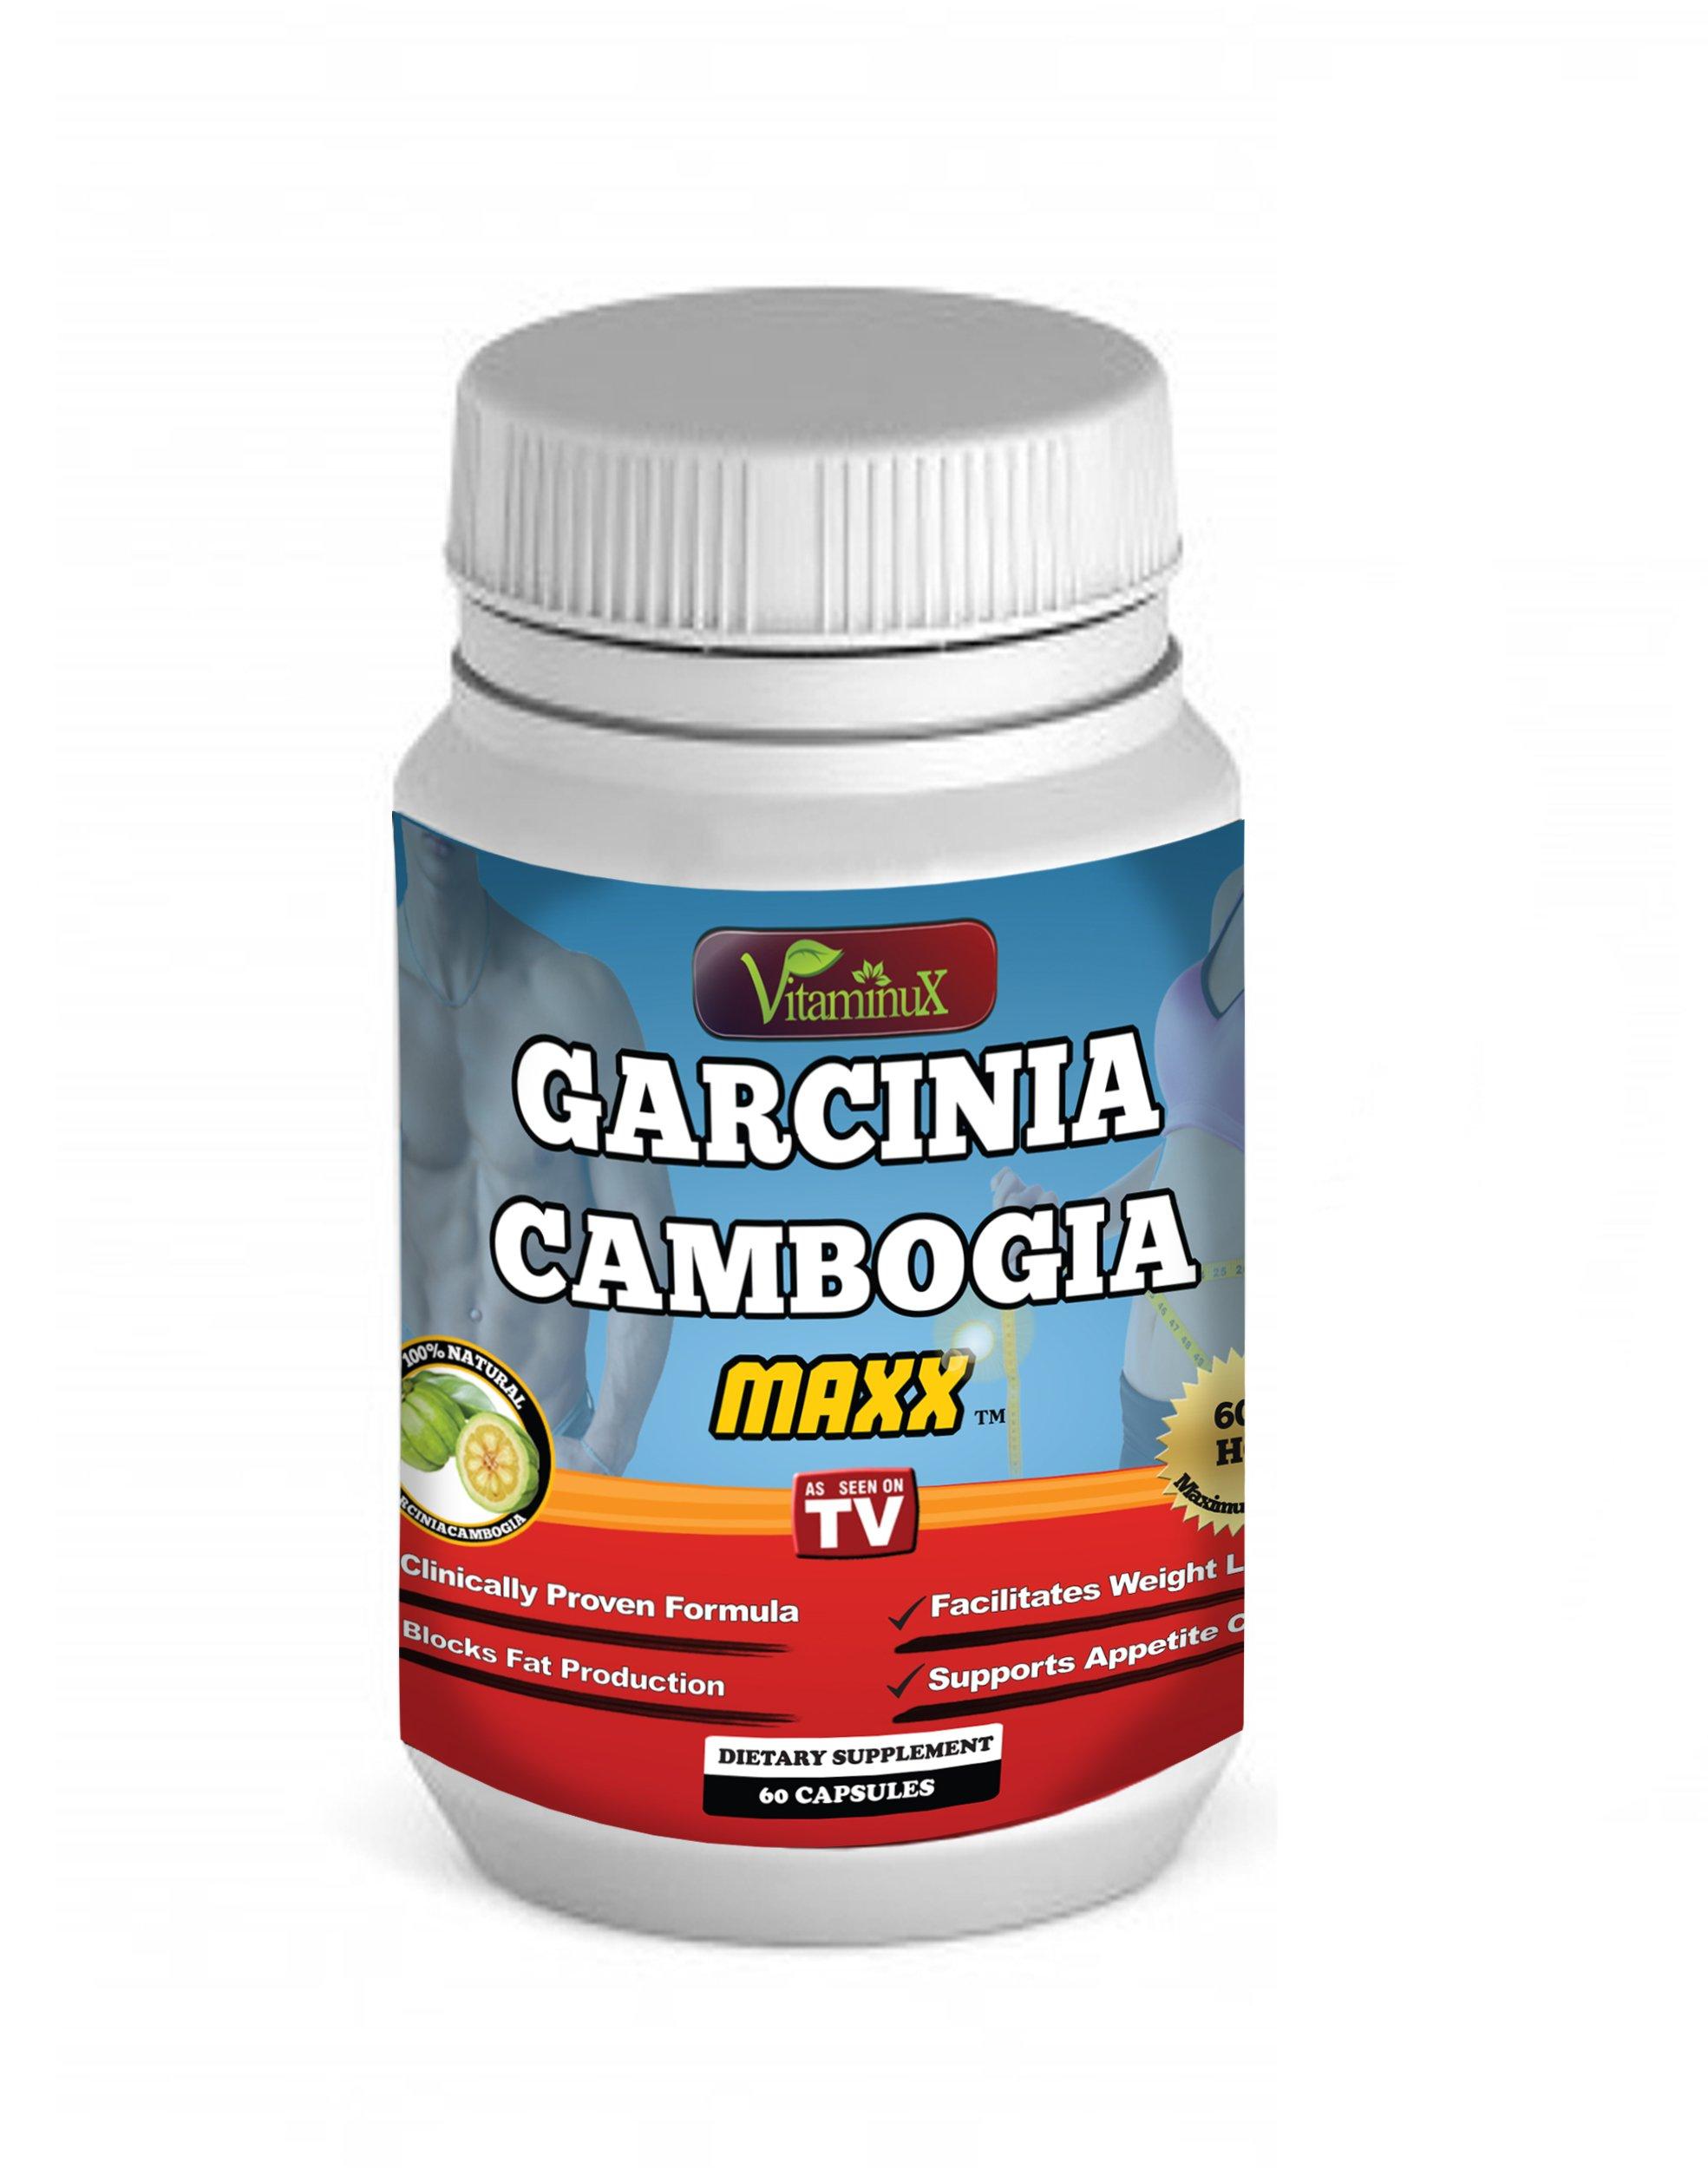 Garcinia Cambogia - Ultra Pure 60% HCA Fruit Extract with Potassium, Chromium & Calcium - Natural Appetite Suppressant Clinical Strength Premium Weight Loss Dietary Supplement Capsules